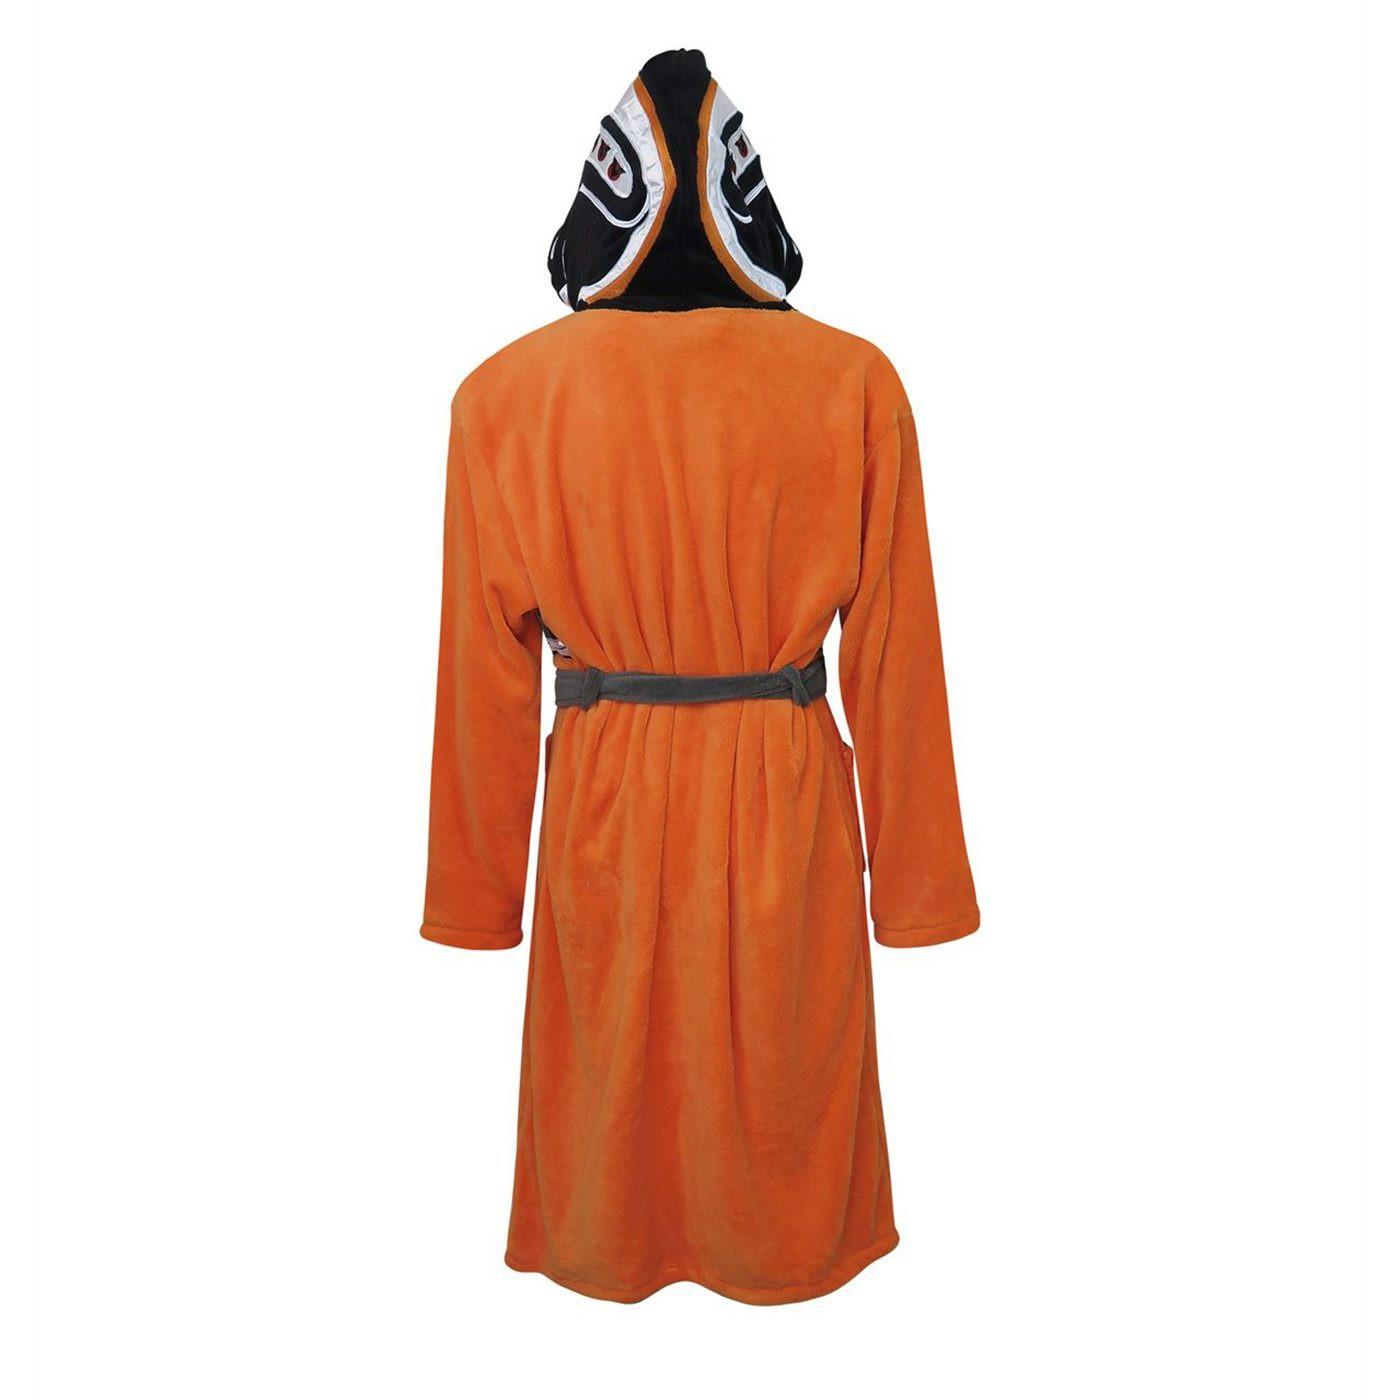 Star Wars X-Wing Fighter Fleece Robe